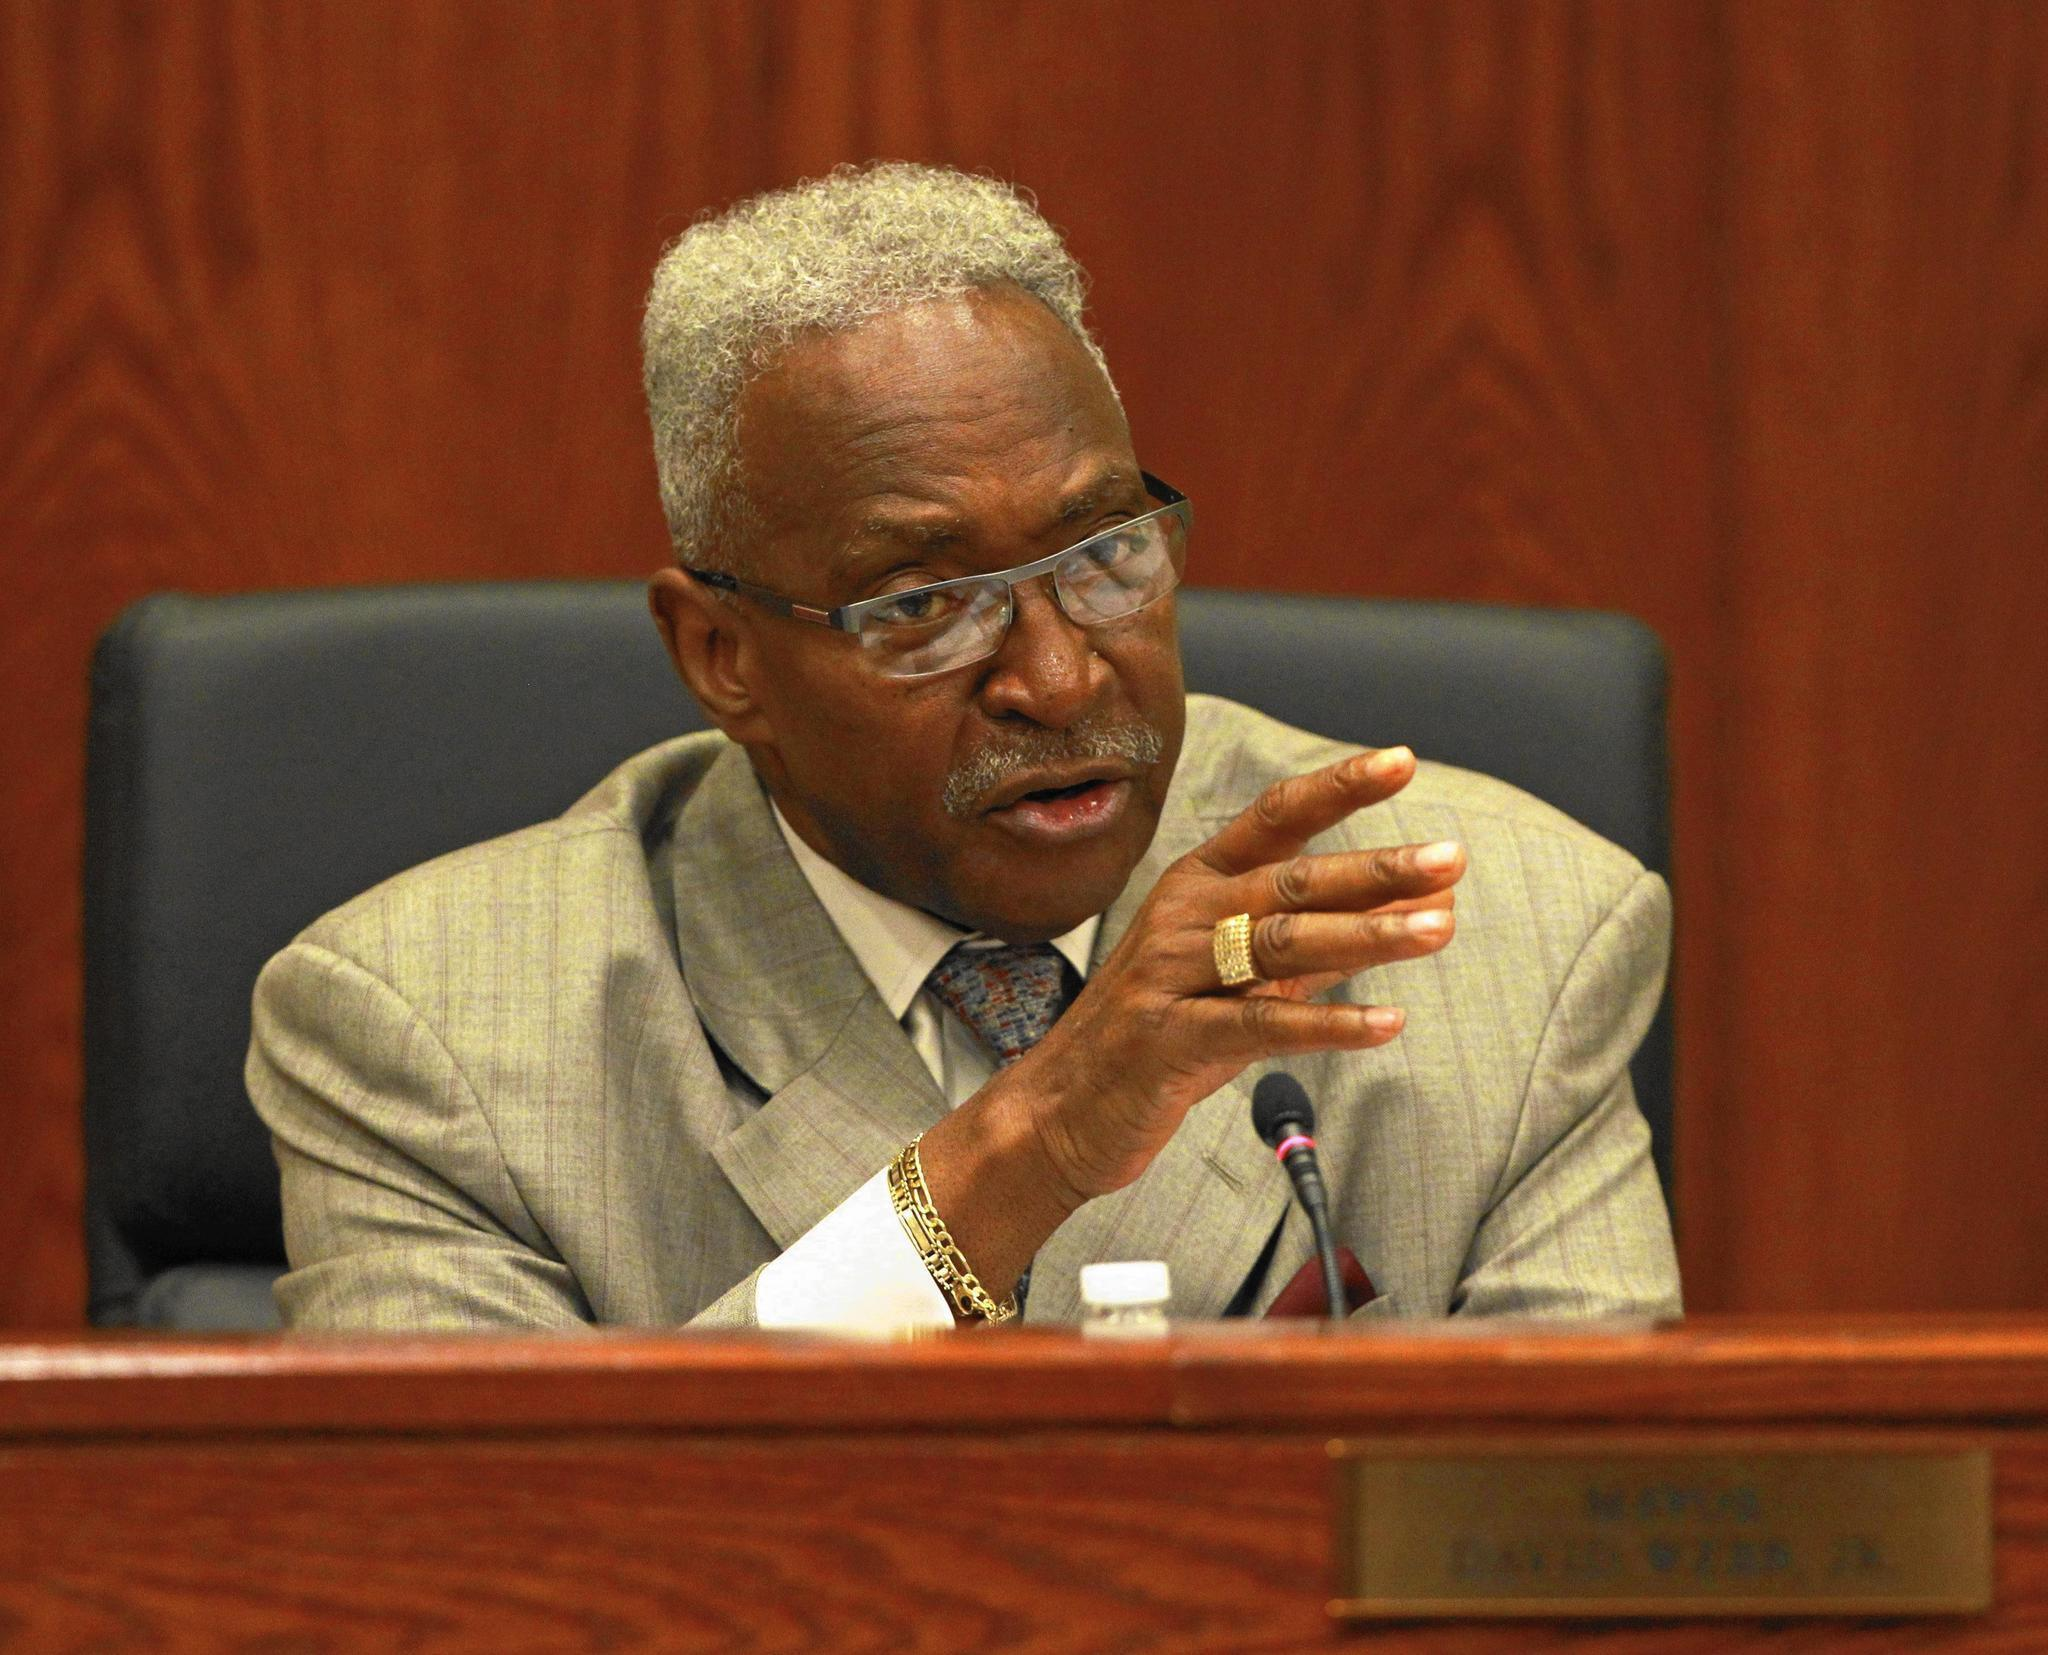 Ex-Markham mayor indicted by federal grand jury in alleged bribery scheme